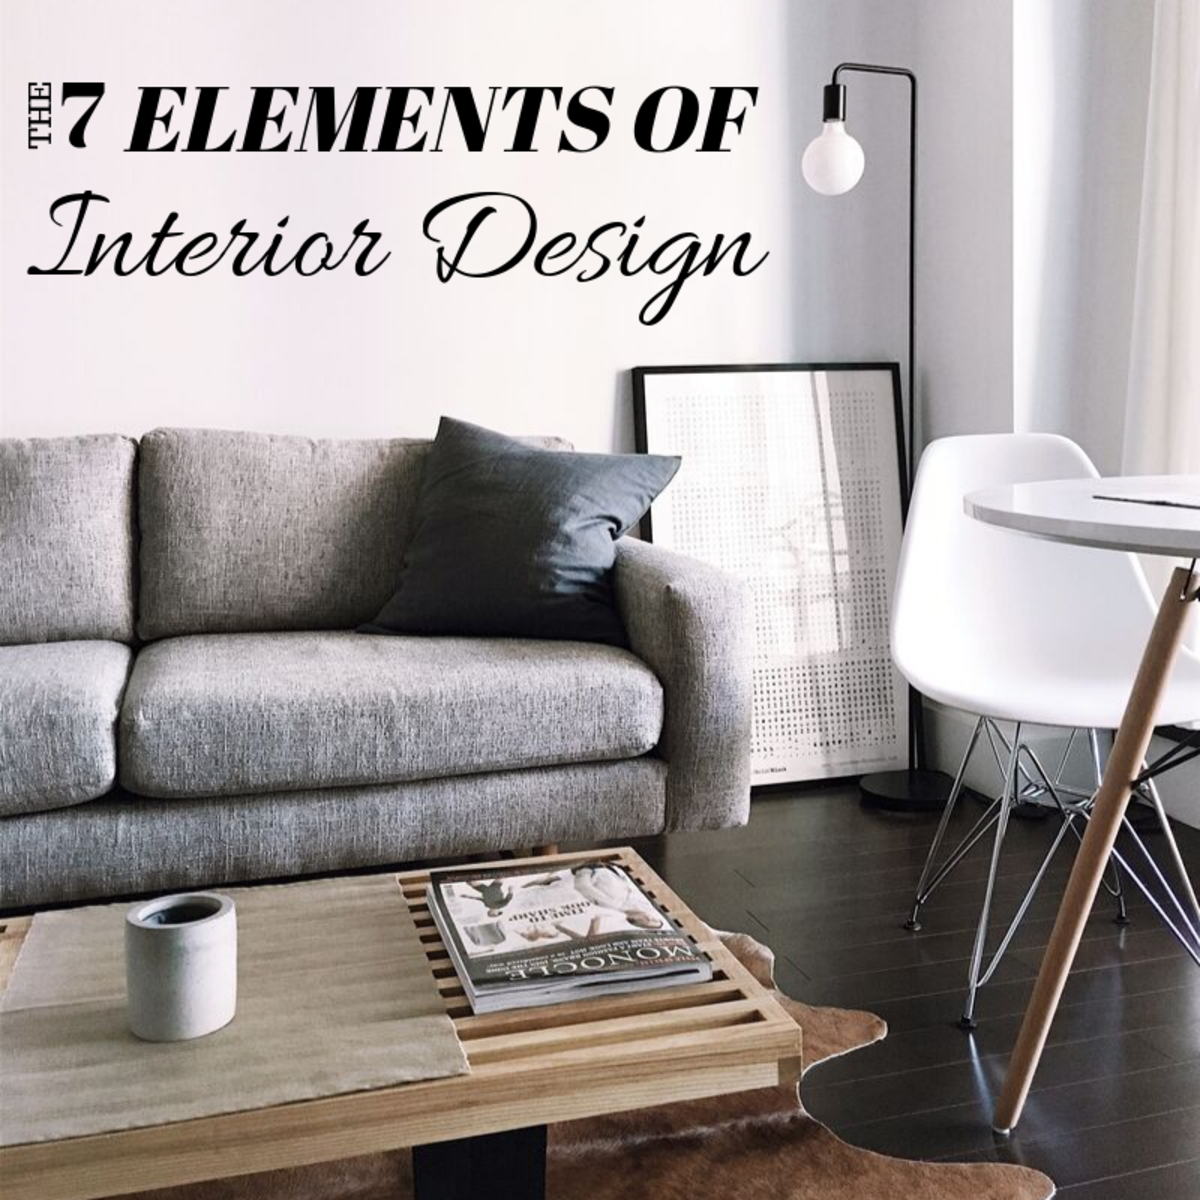 The Seven Elements of Interior Design